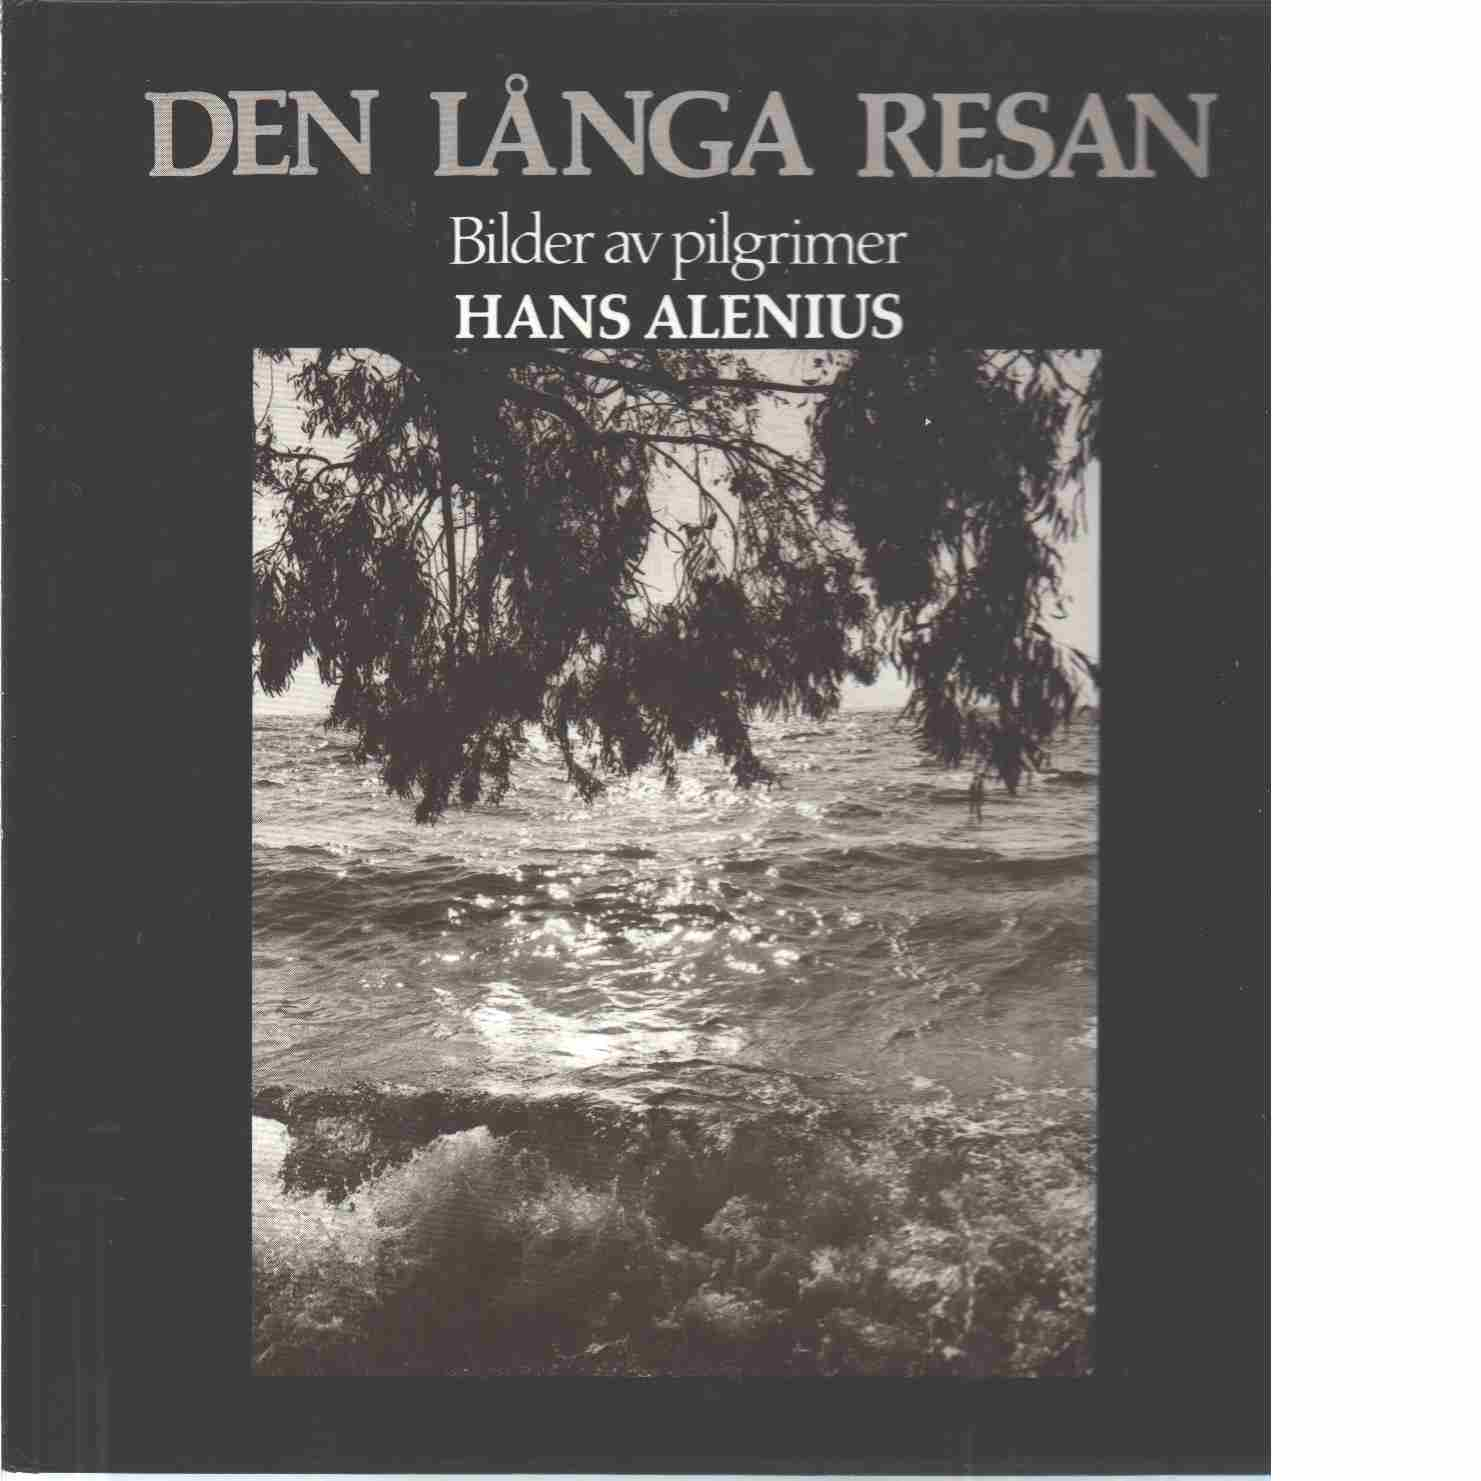 Den långa resan : bilder av pilgrimer - Alenius, Hans